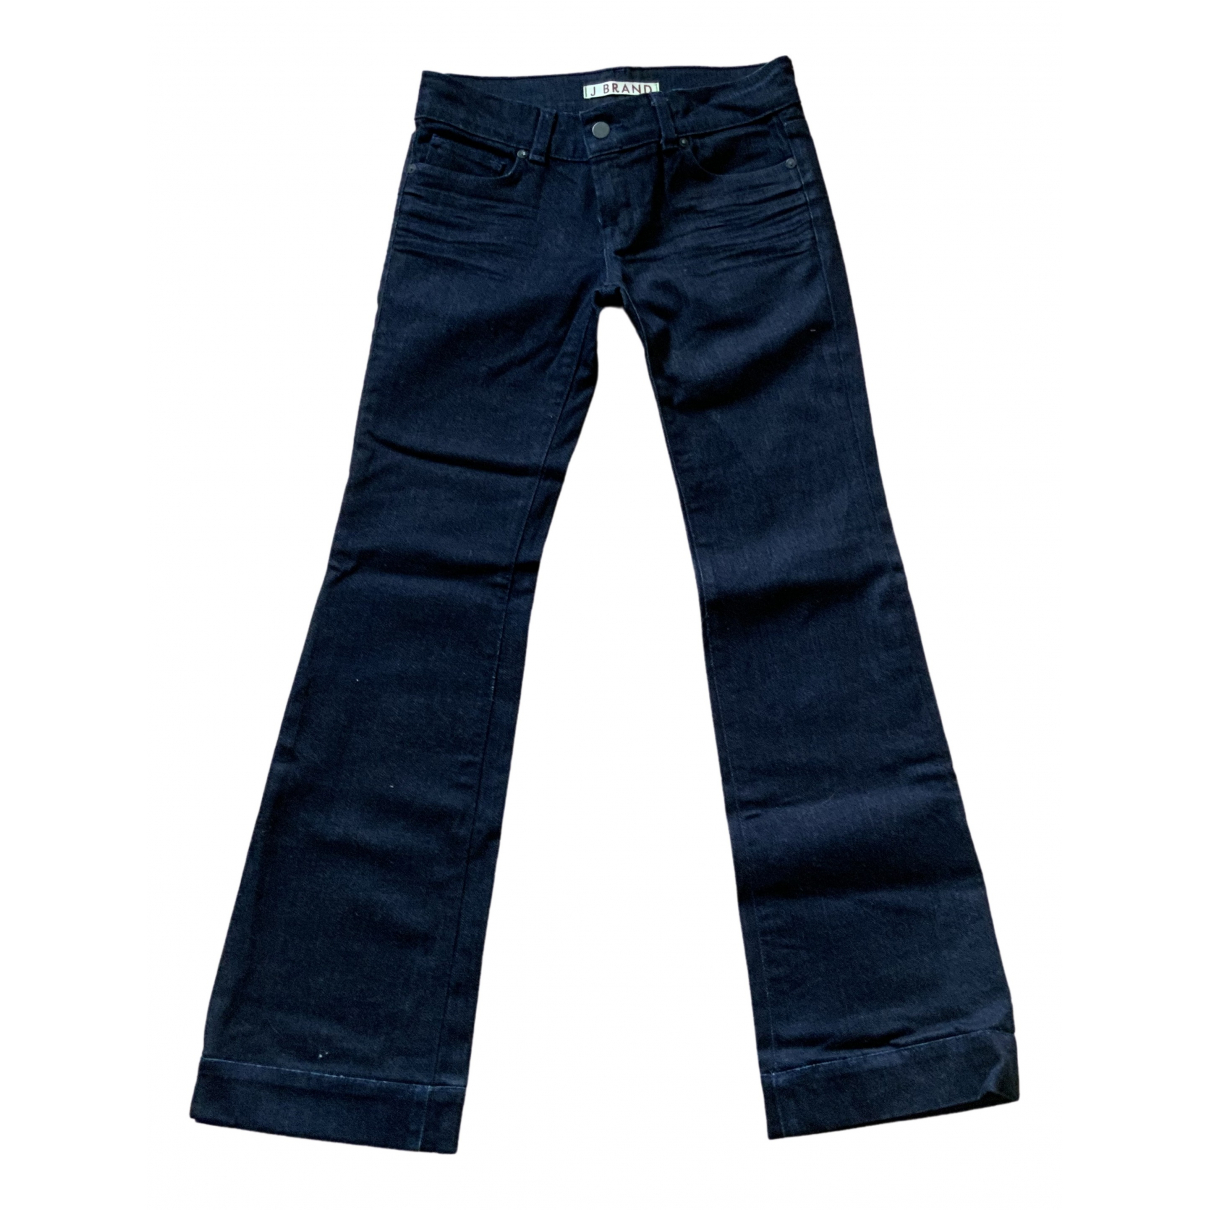 J Brand \N Navy Cotton - elasthane Jeans for Women 26 US